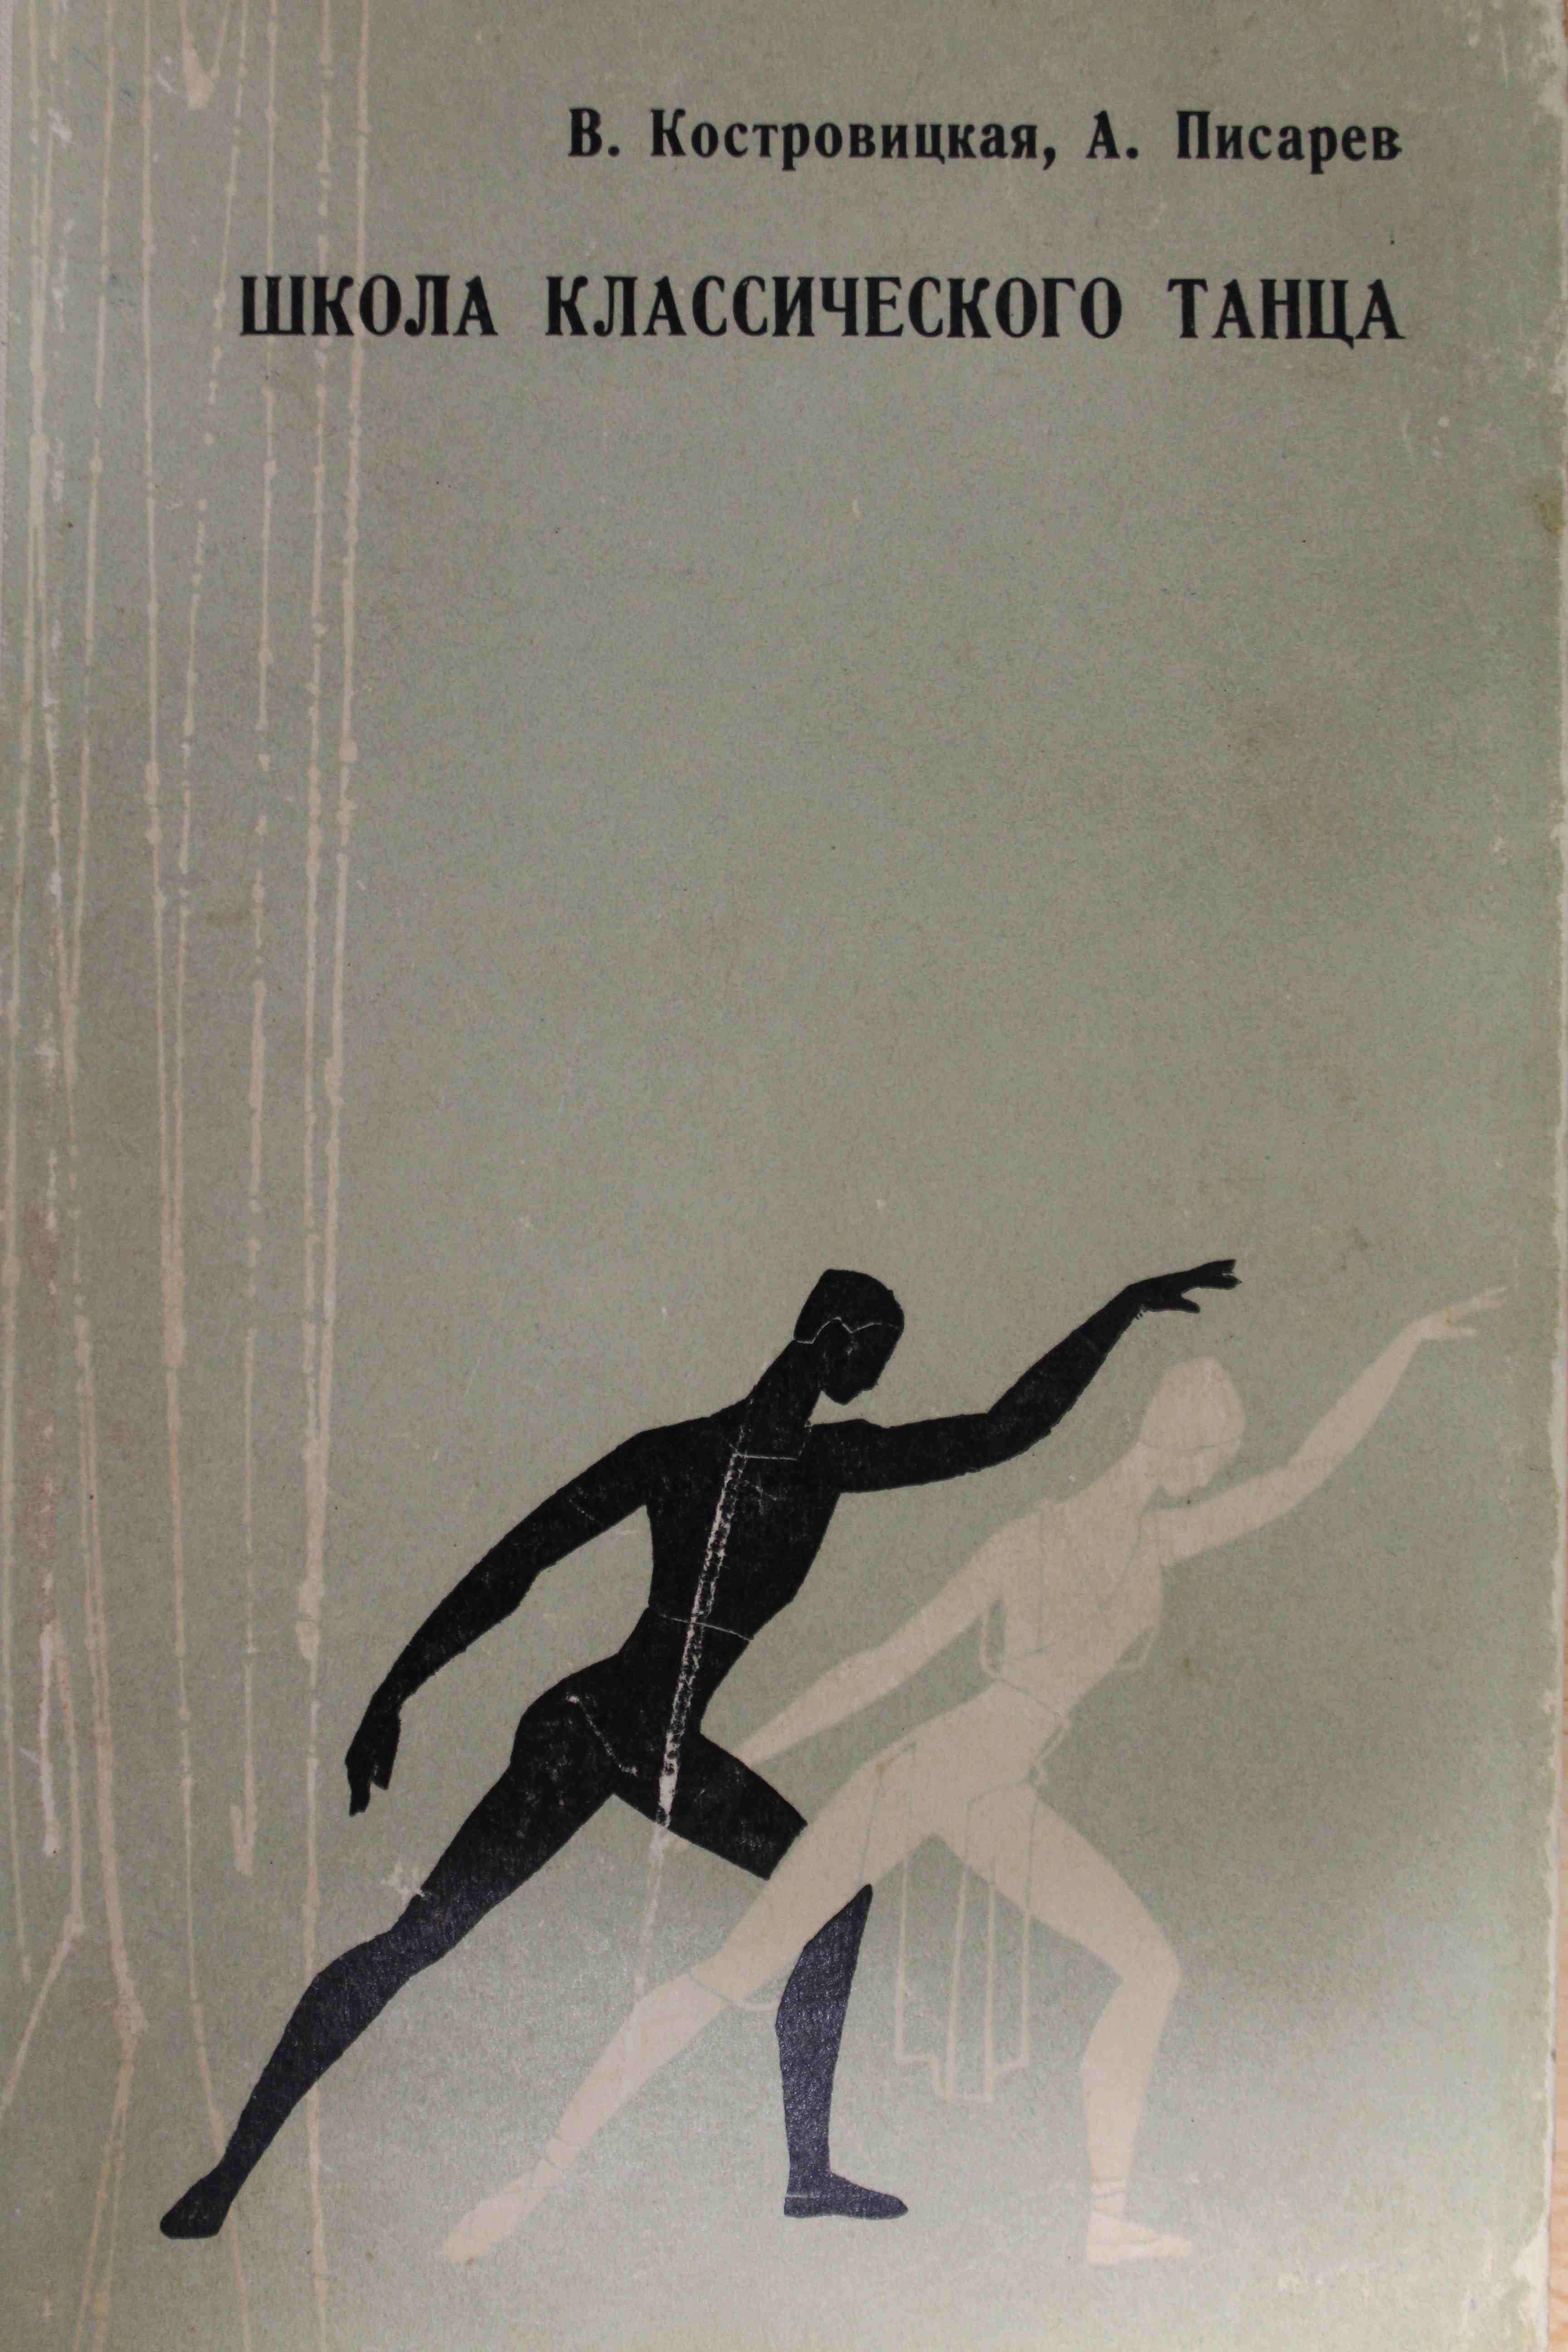 Scuola di Danza Classica (1968) - V. S. Kostrovitskaja - A. A. Pisarev - Школа классического танца (1968) - В. C. Костровицкая - А. A. Писарев